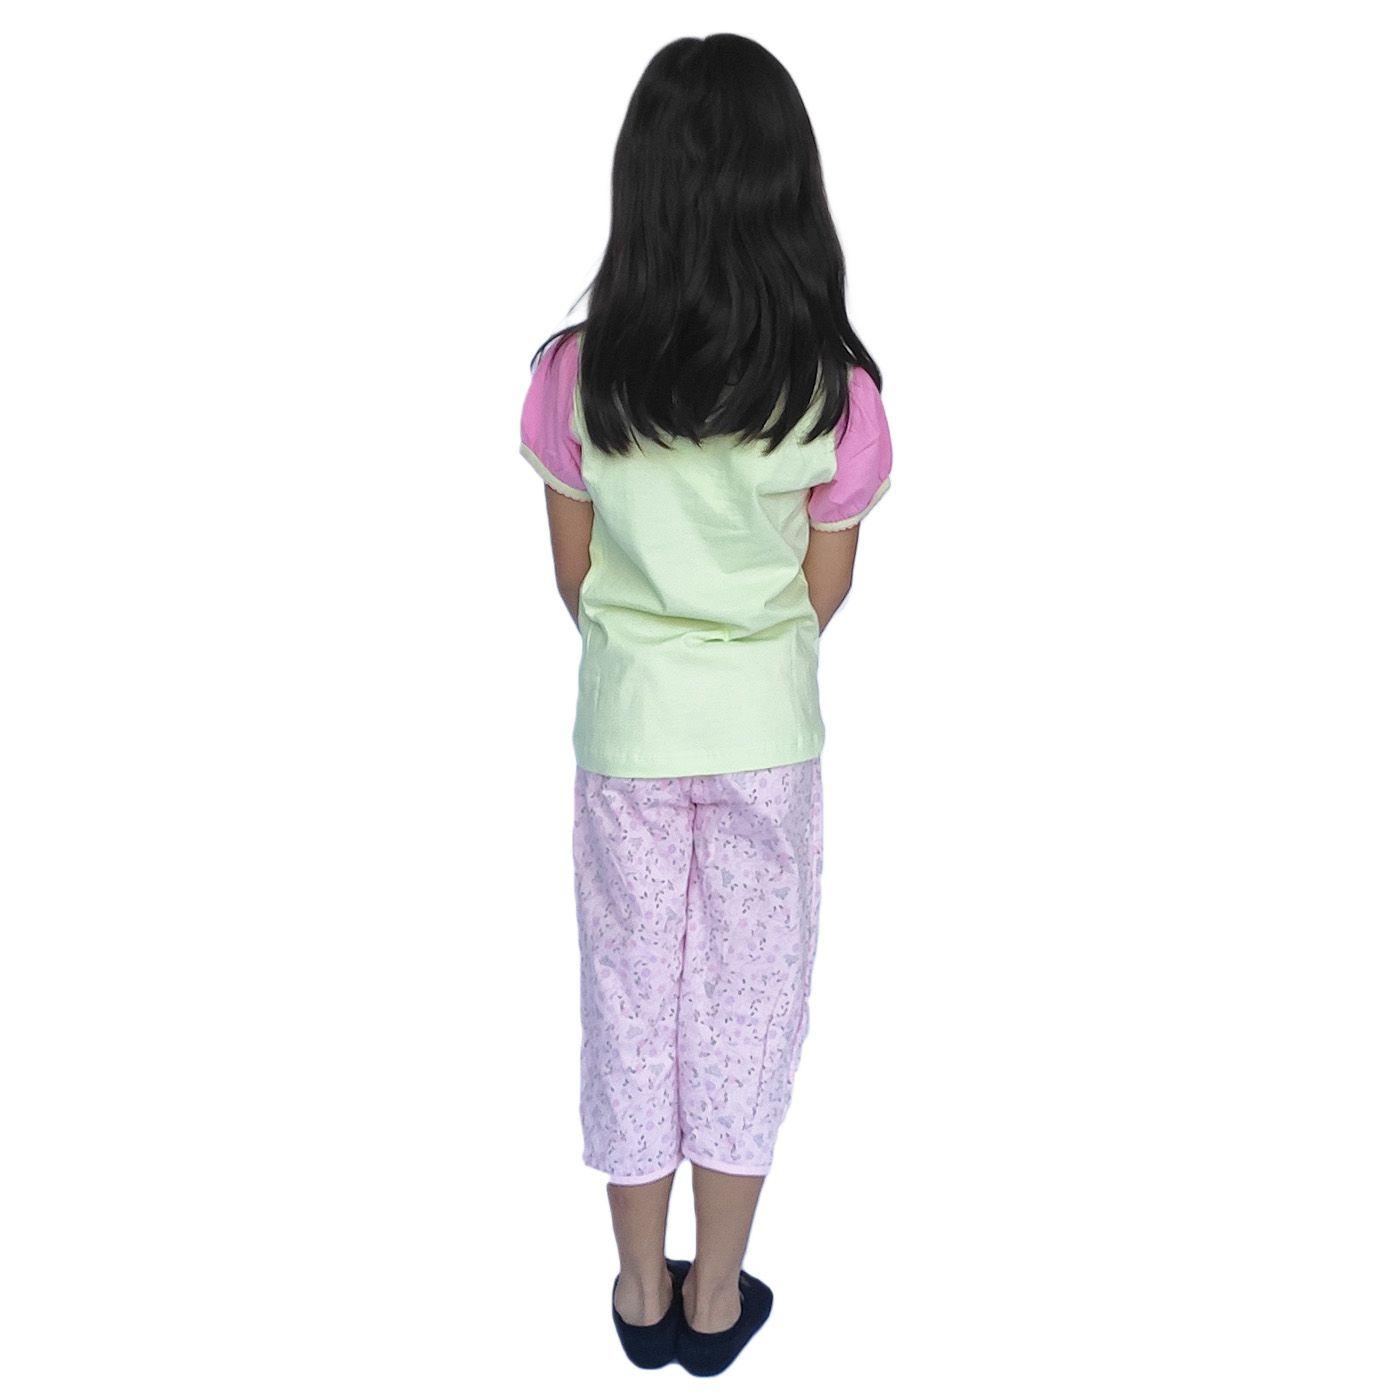 Pijama infantil algodão princesas disney castelo lupo kids